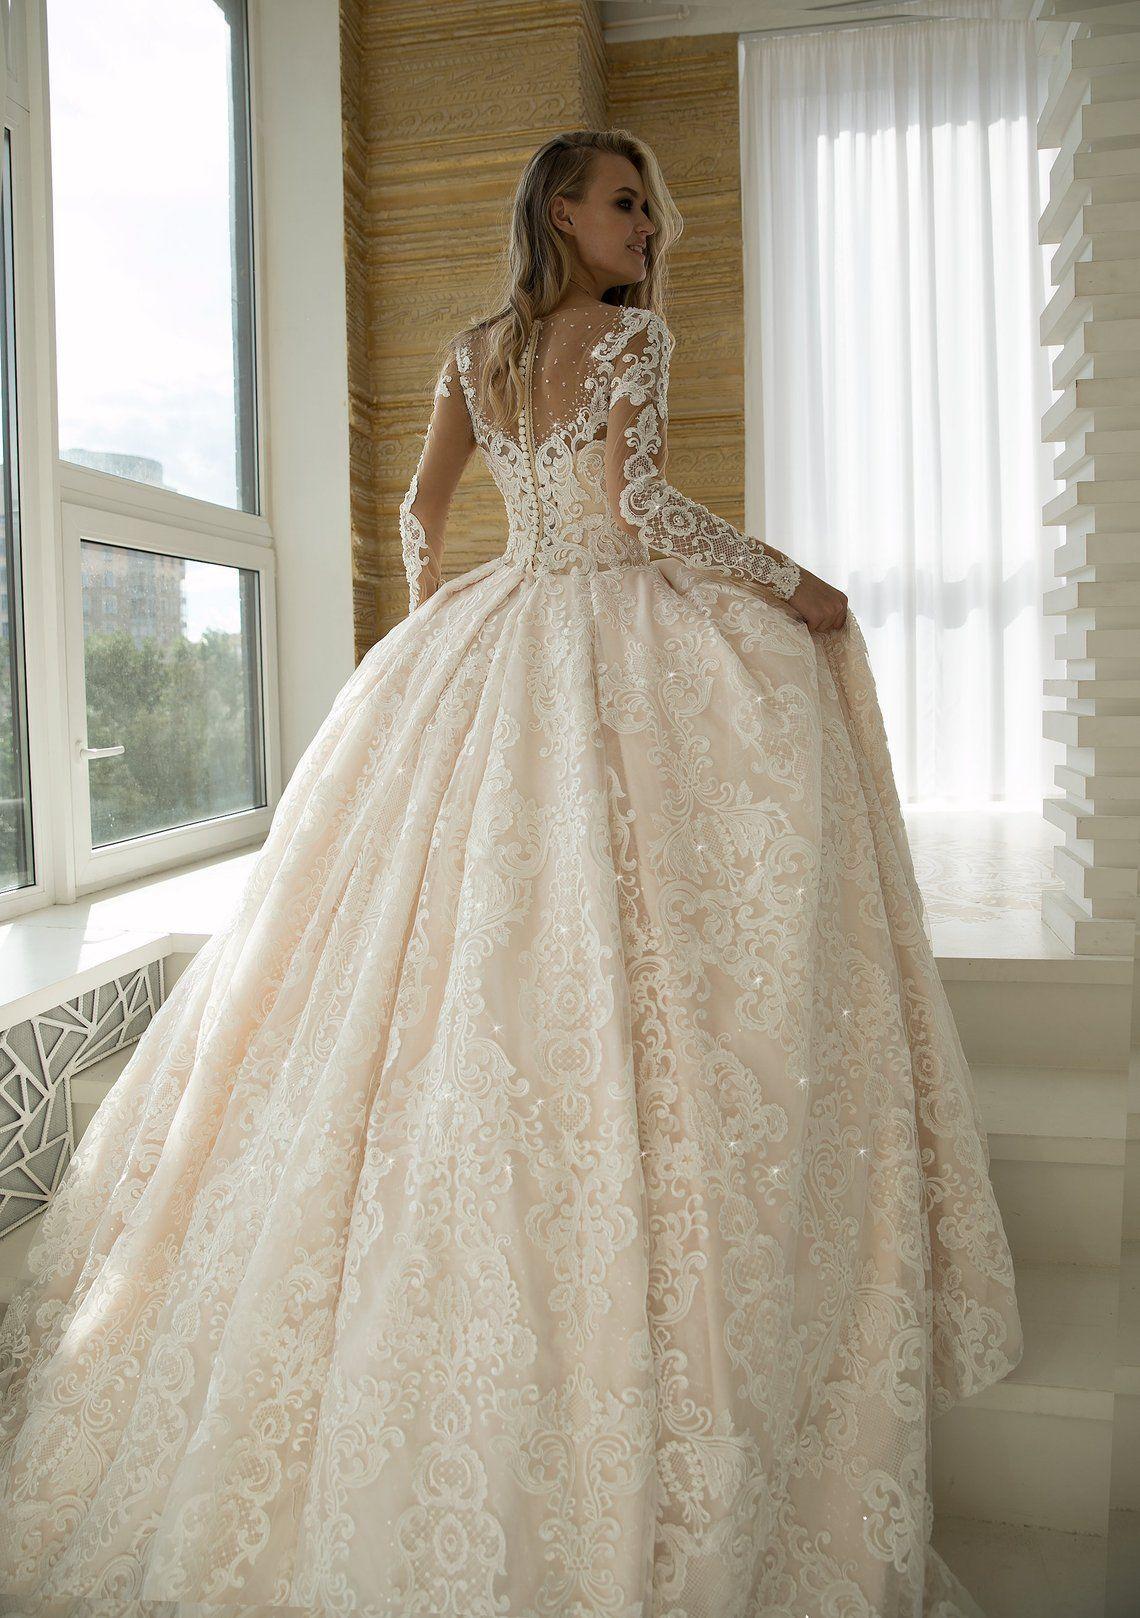 Elmis By Olivia Bottega Floral Lace Wedding Gown Wedding Etsy In 2021 Wedding Dress Long Sleeve Wedding Dresses For Girls Wedding Gowns Lace [ 1618 x 1140 Pixel ]